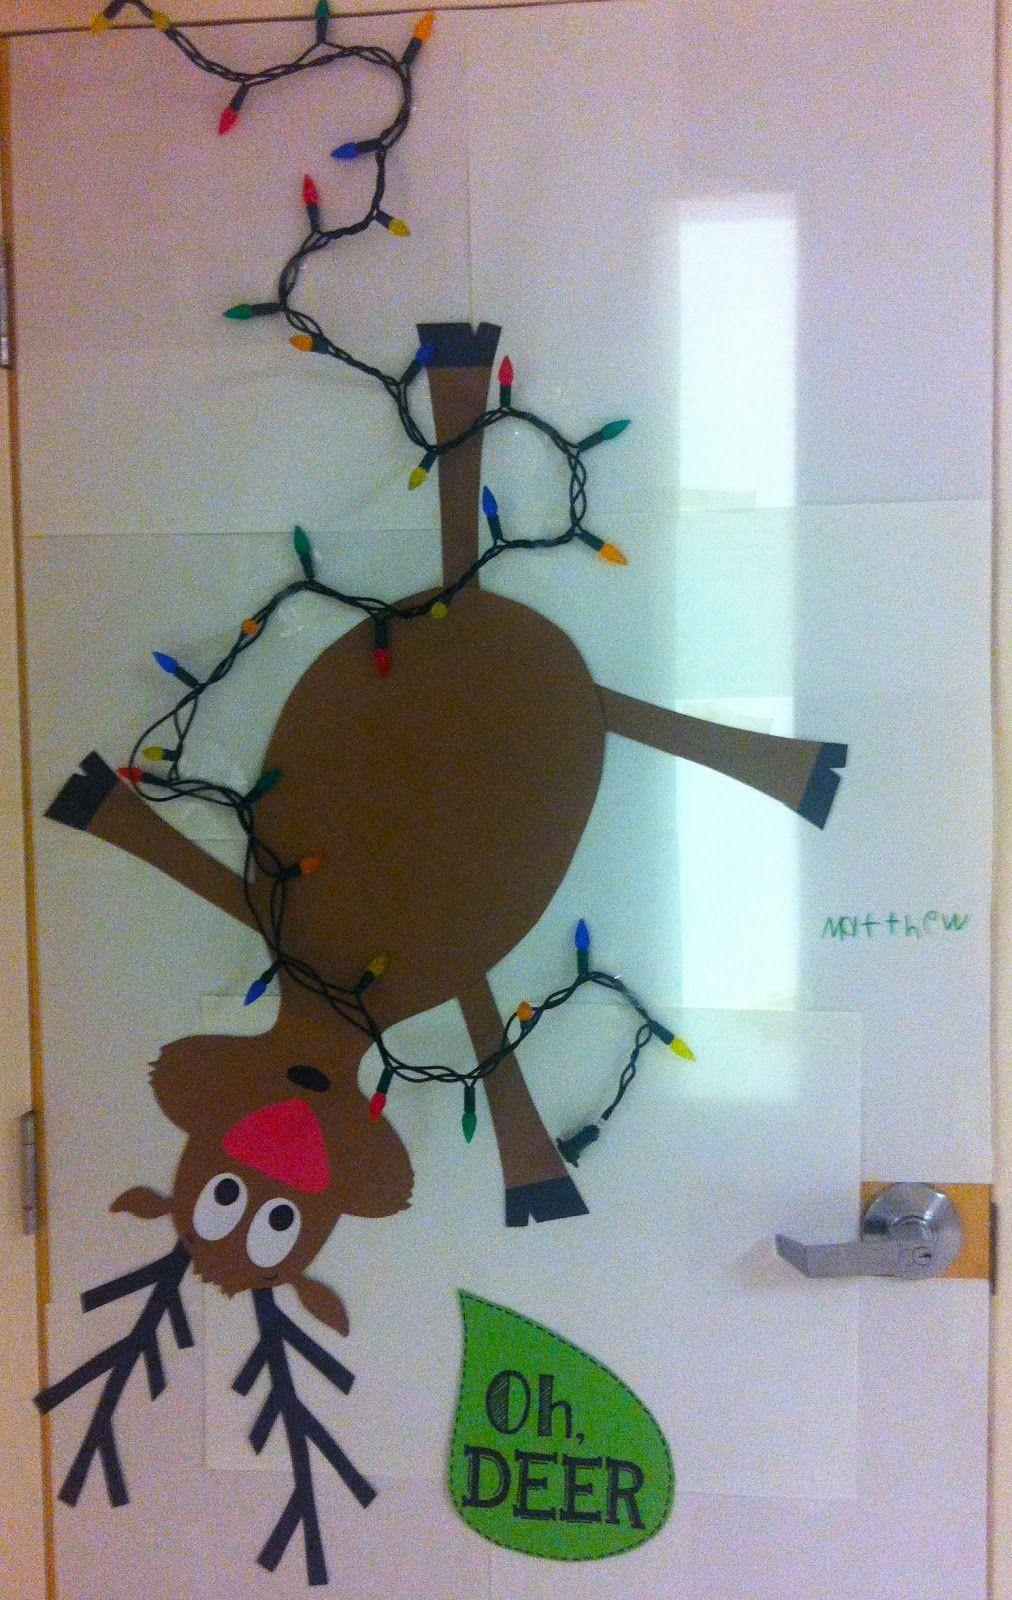 Merry Christmas Merry ChristmasChristmas IdeasChristmas Door Decorating